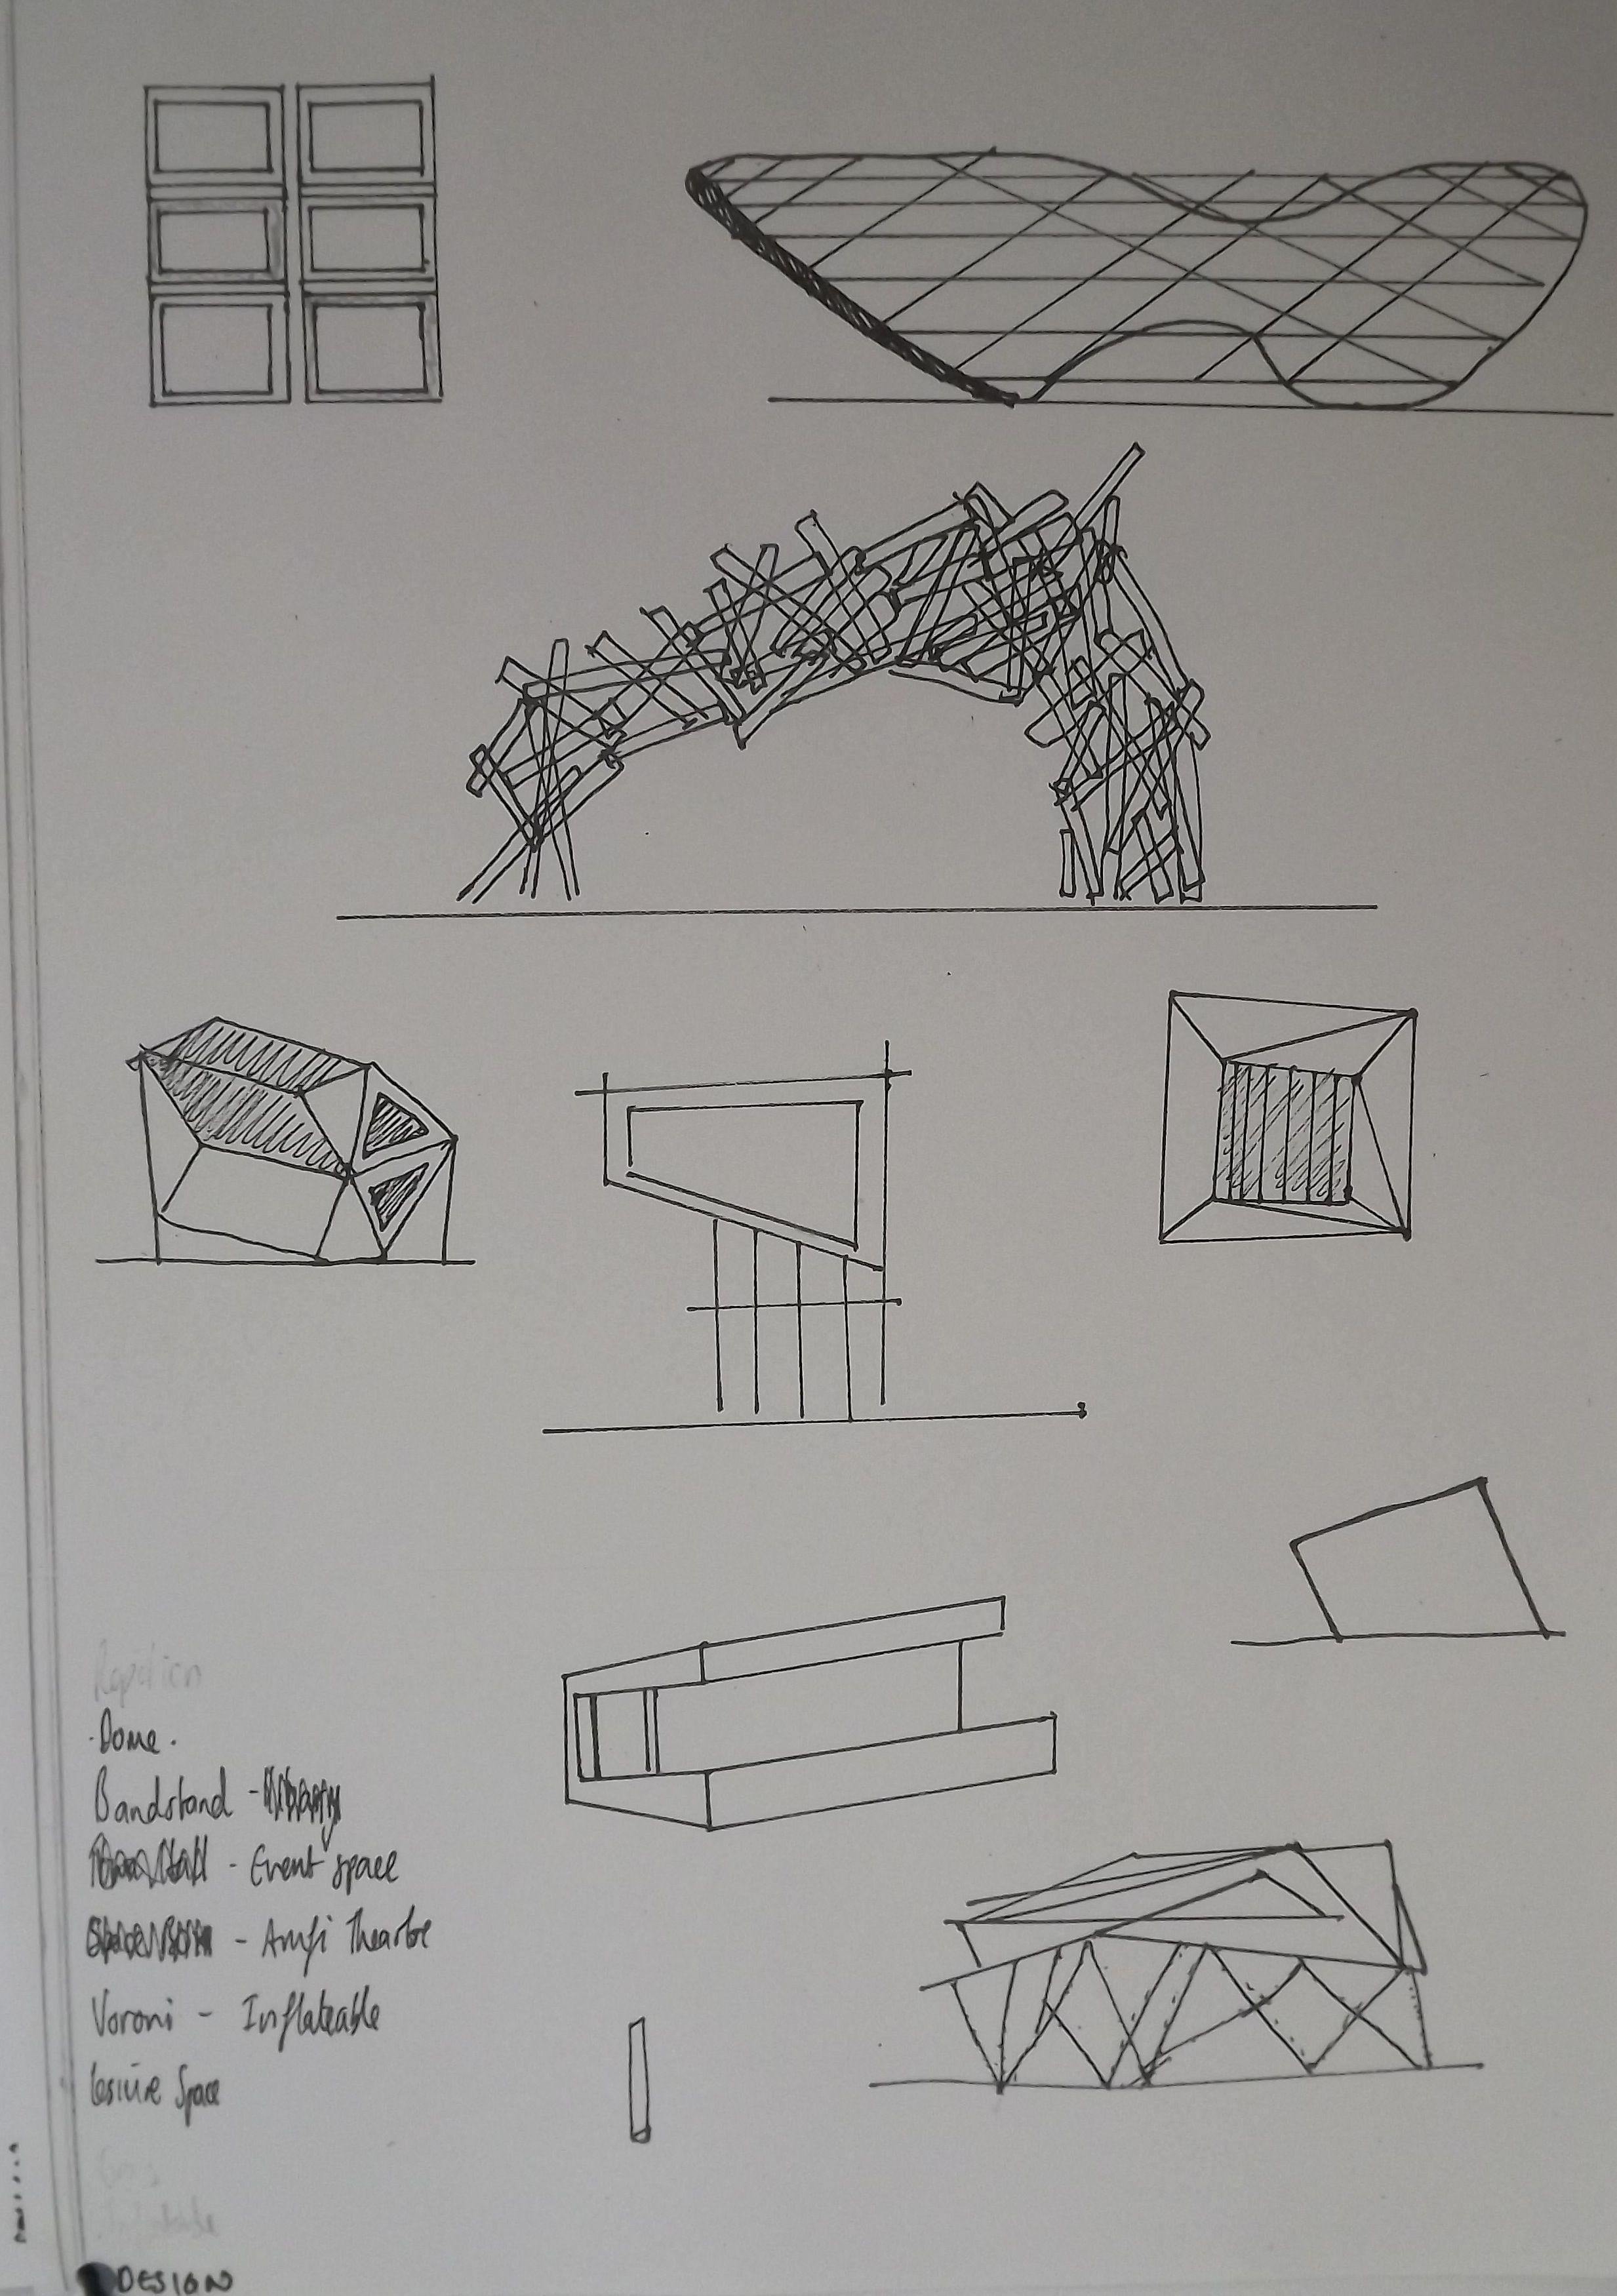 Organic Architecture Sketches - Google Search | Conceptuals | Pinterest | Organic Architecture ...